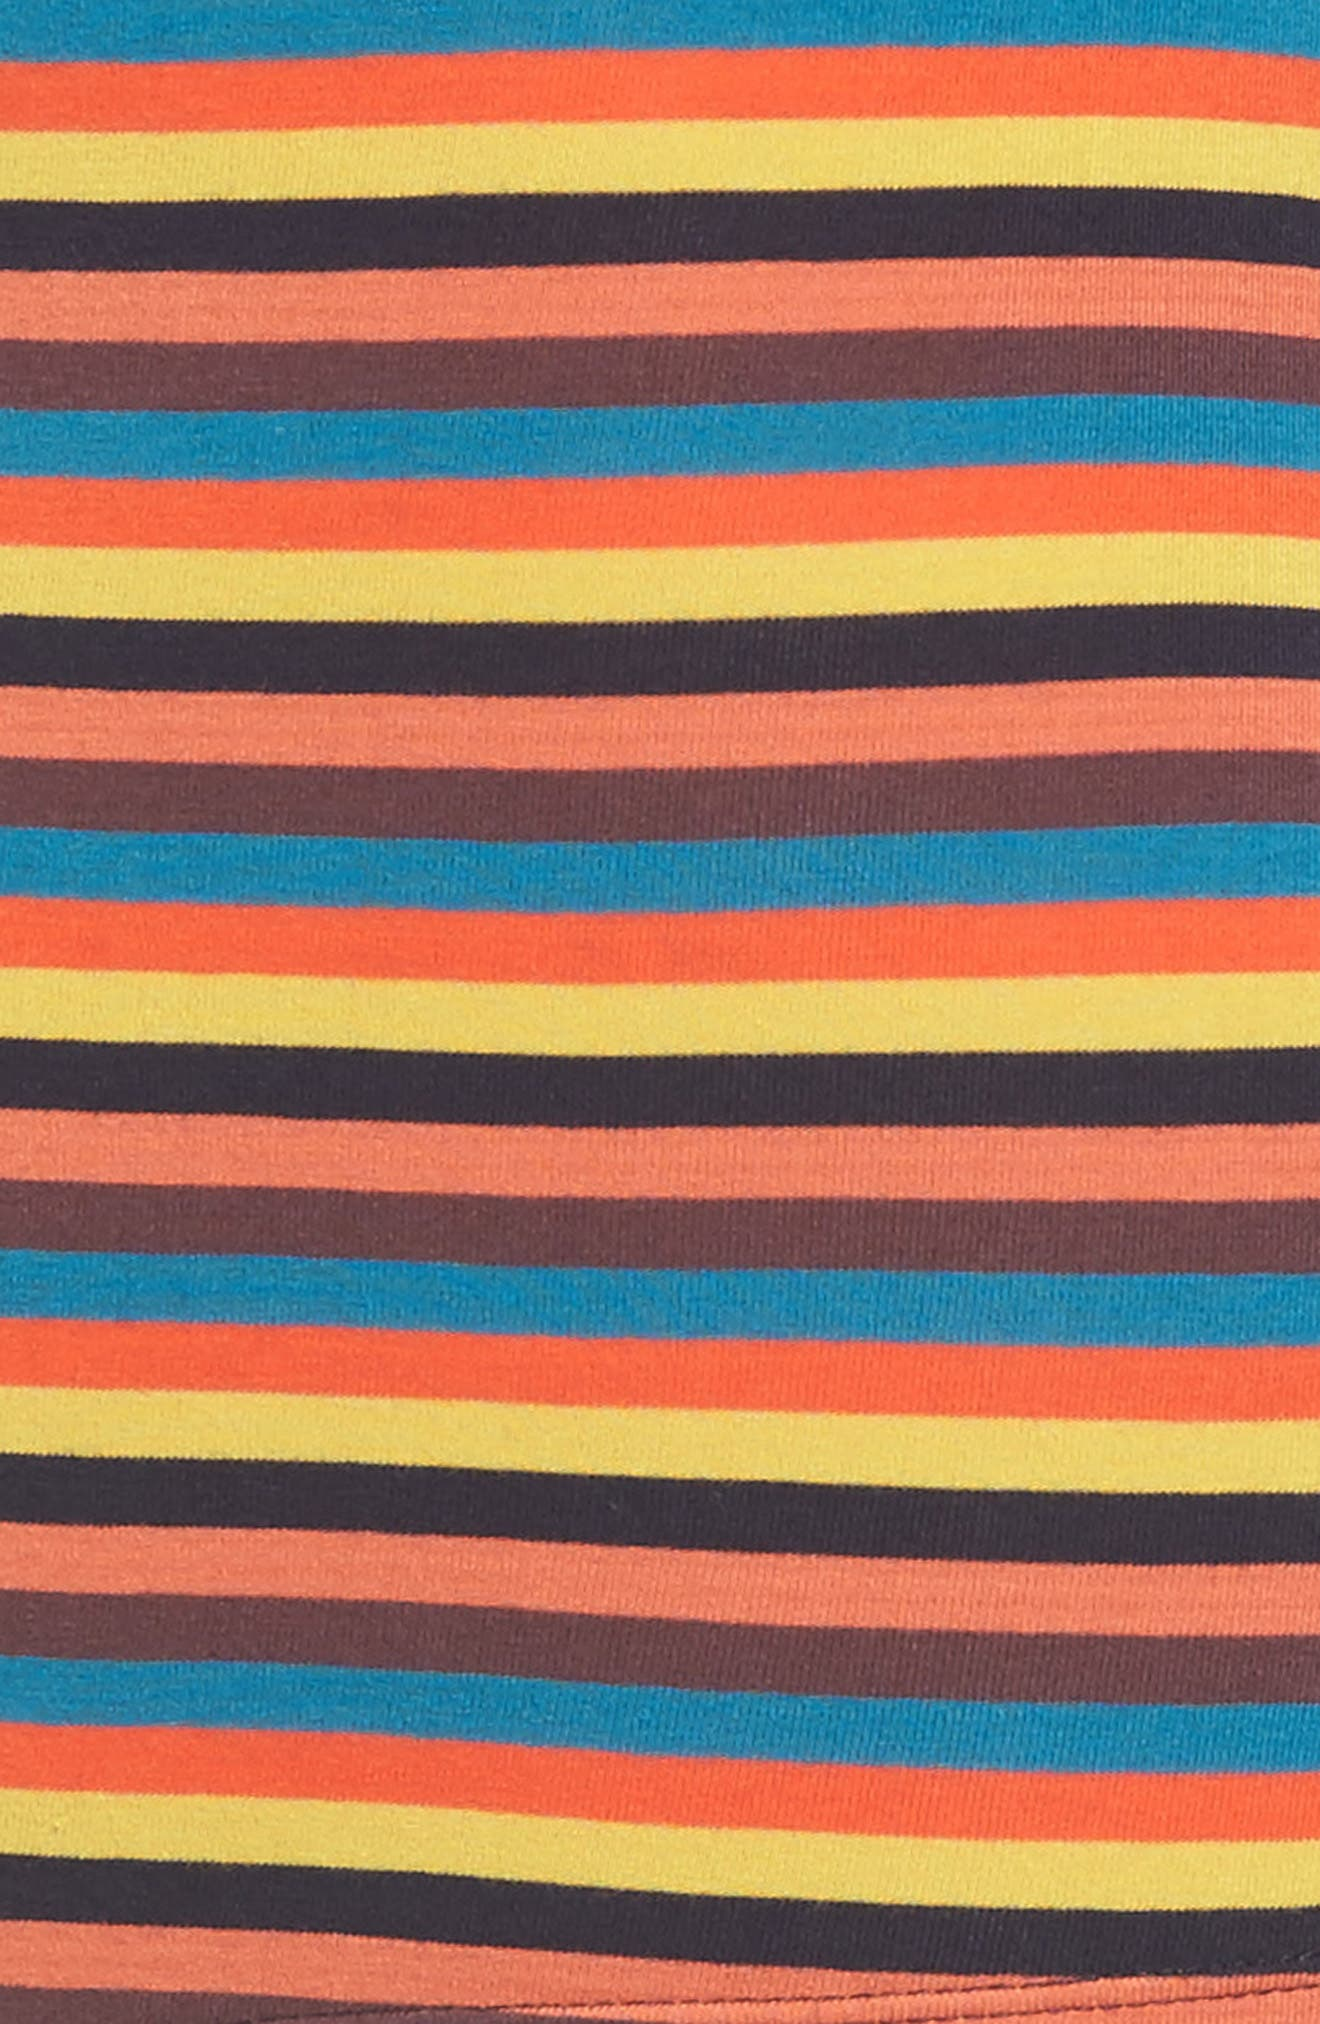 Stripe Stretch Cotton Trunks,                             Alternate thumbnail 4, color,                             ORANGE/ BLACK MULTI